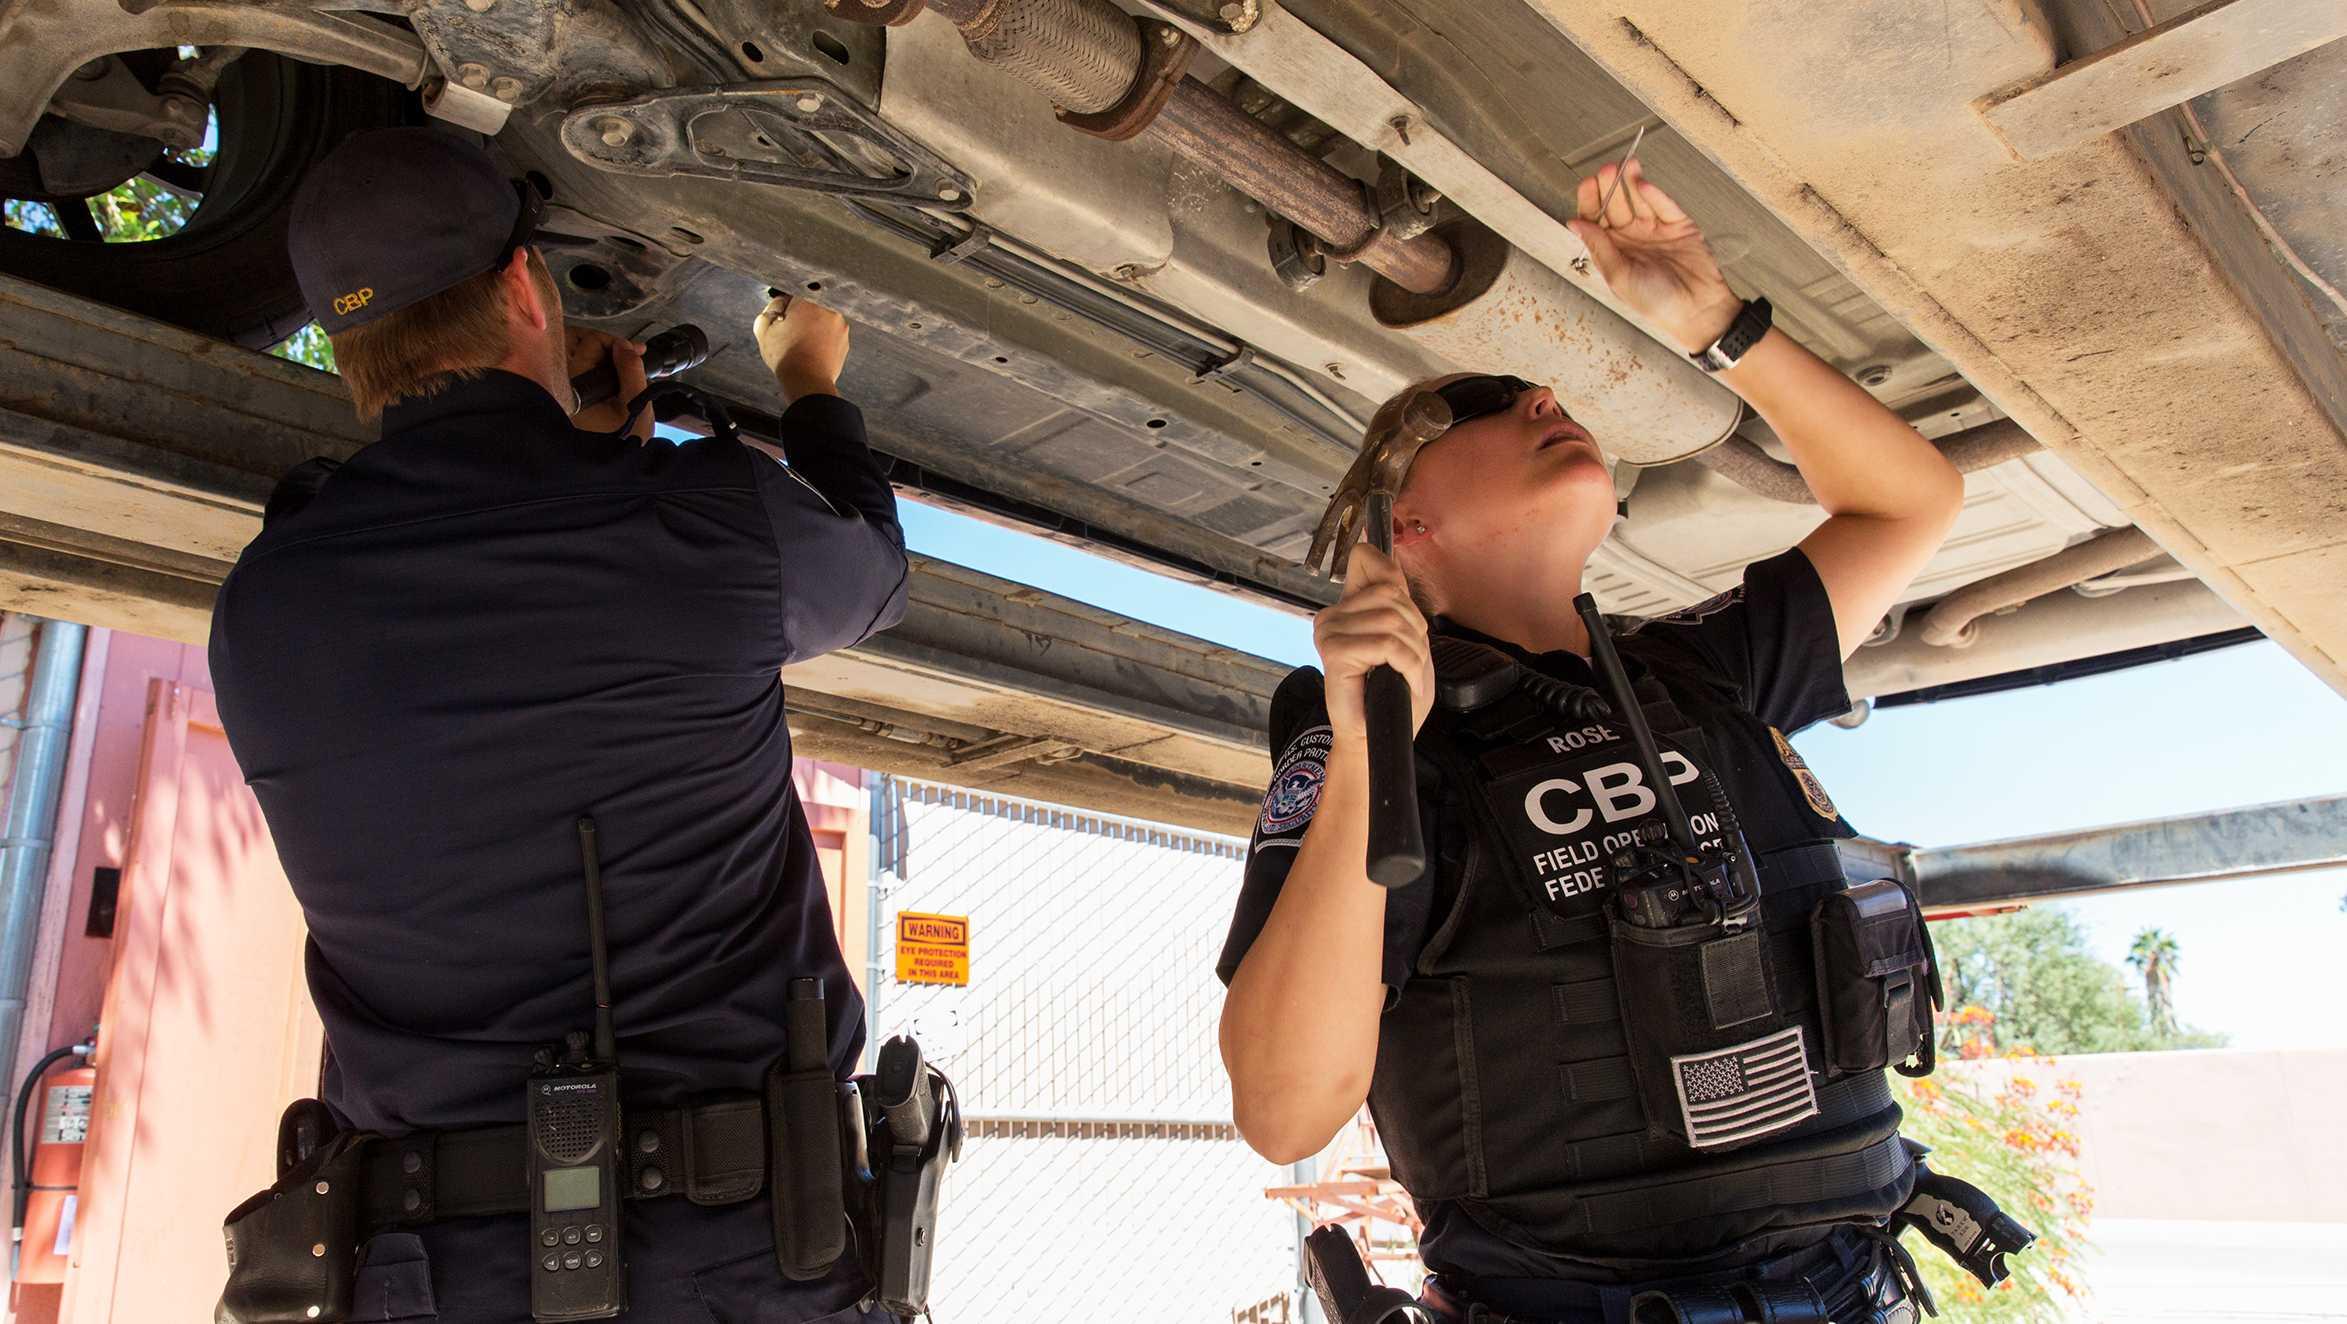 U.S. border agents search a car